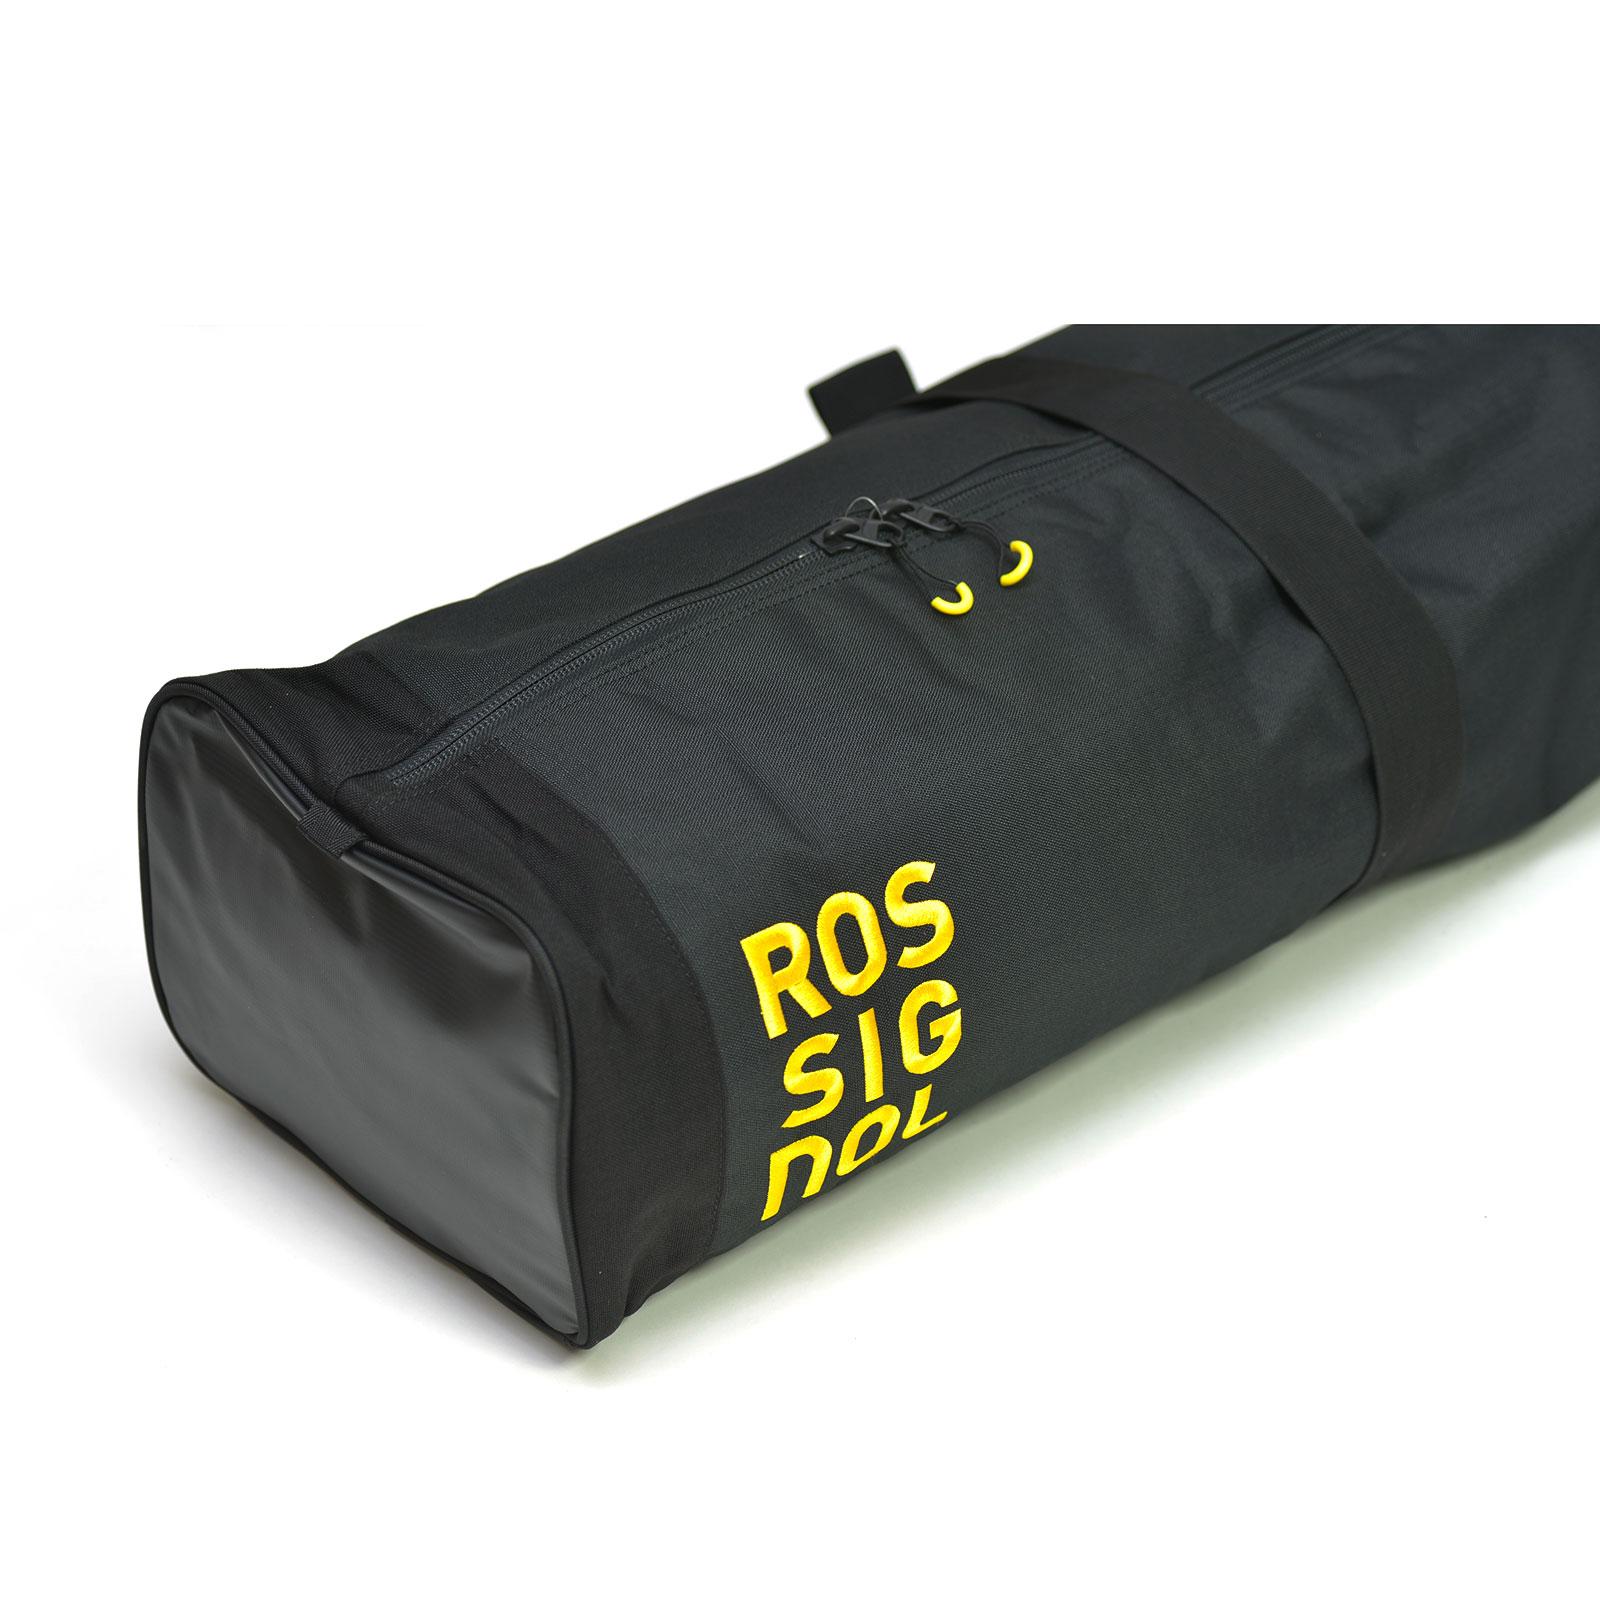 Rossignol Long Haul 1 Pair Ski Bag Heavy Duty Alpine